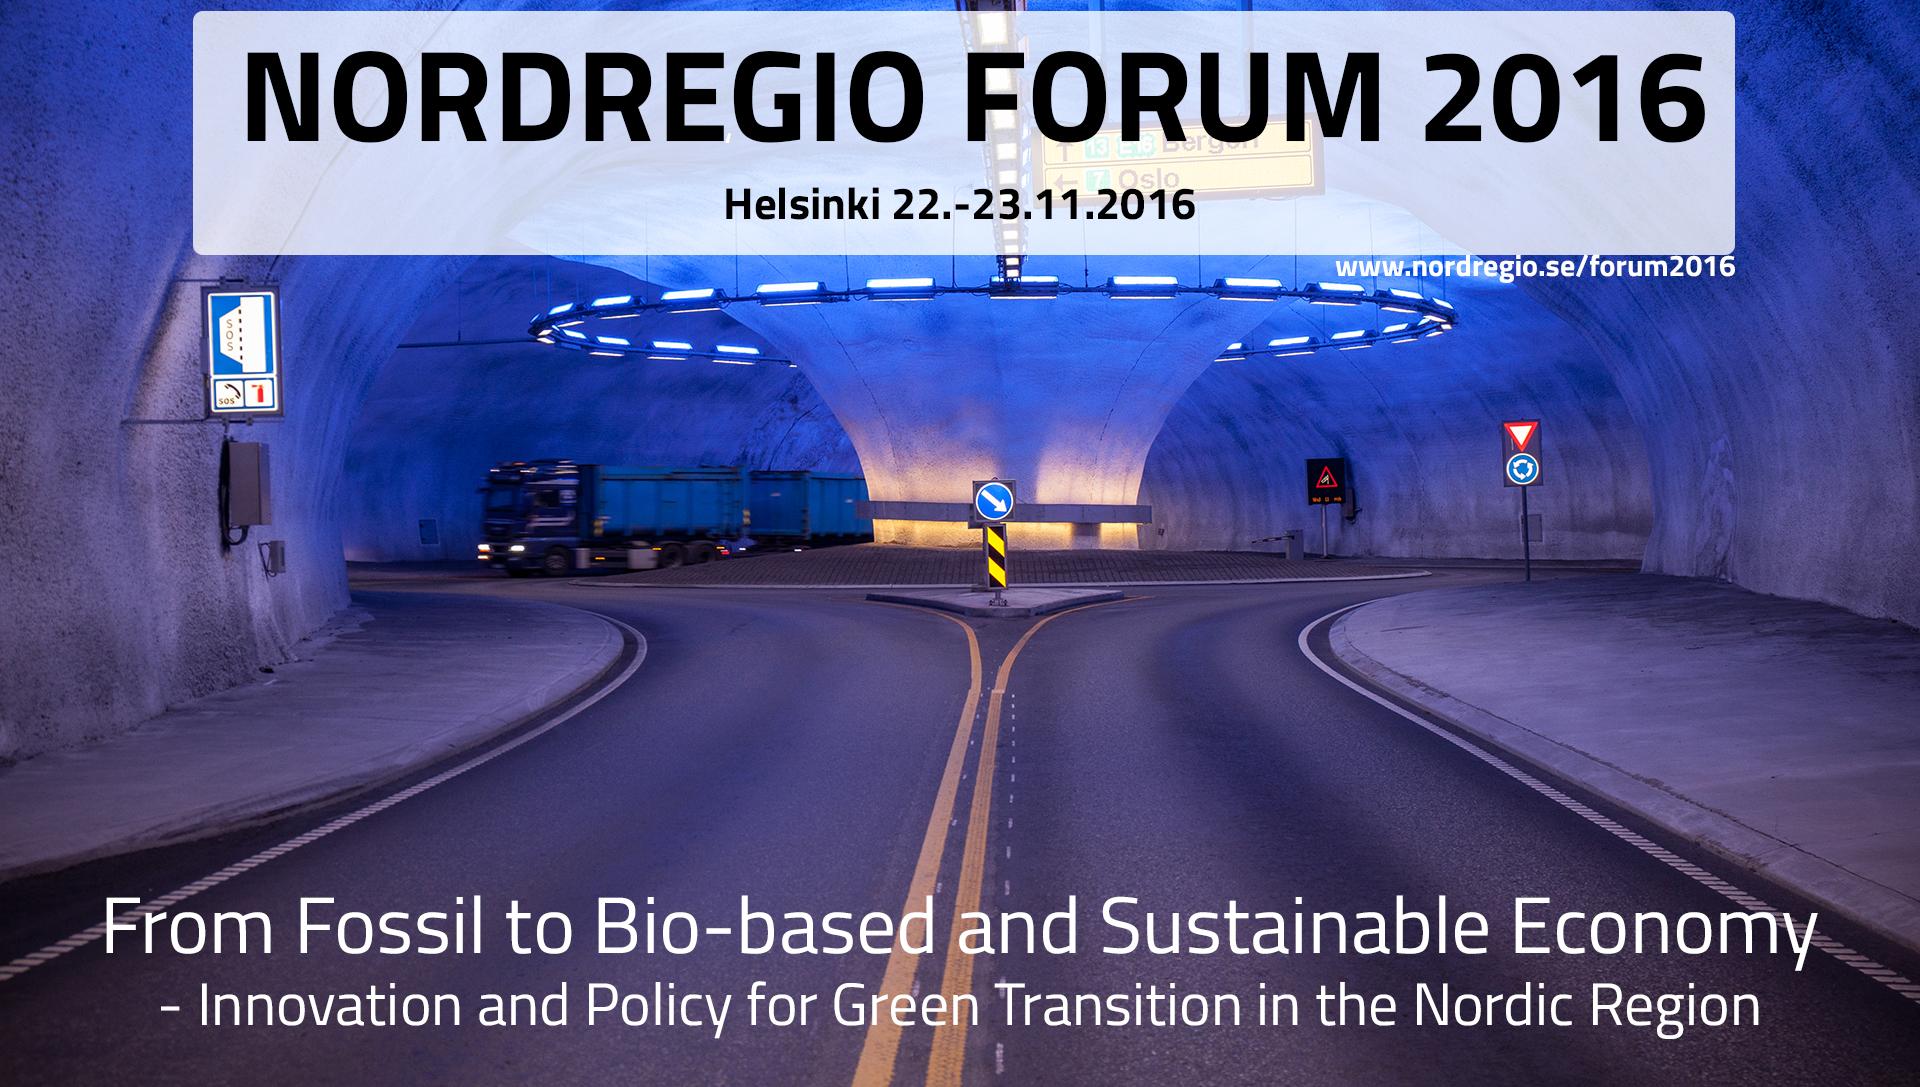 Nordregio Forum 2016